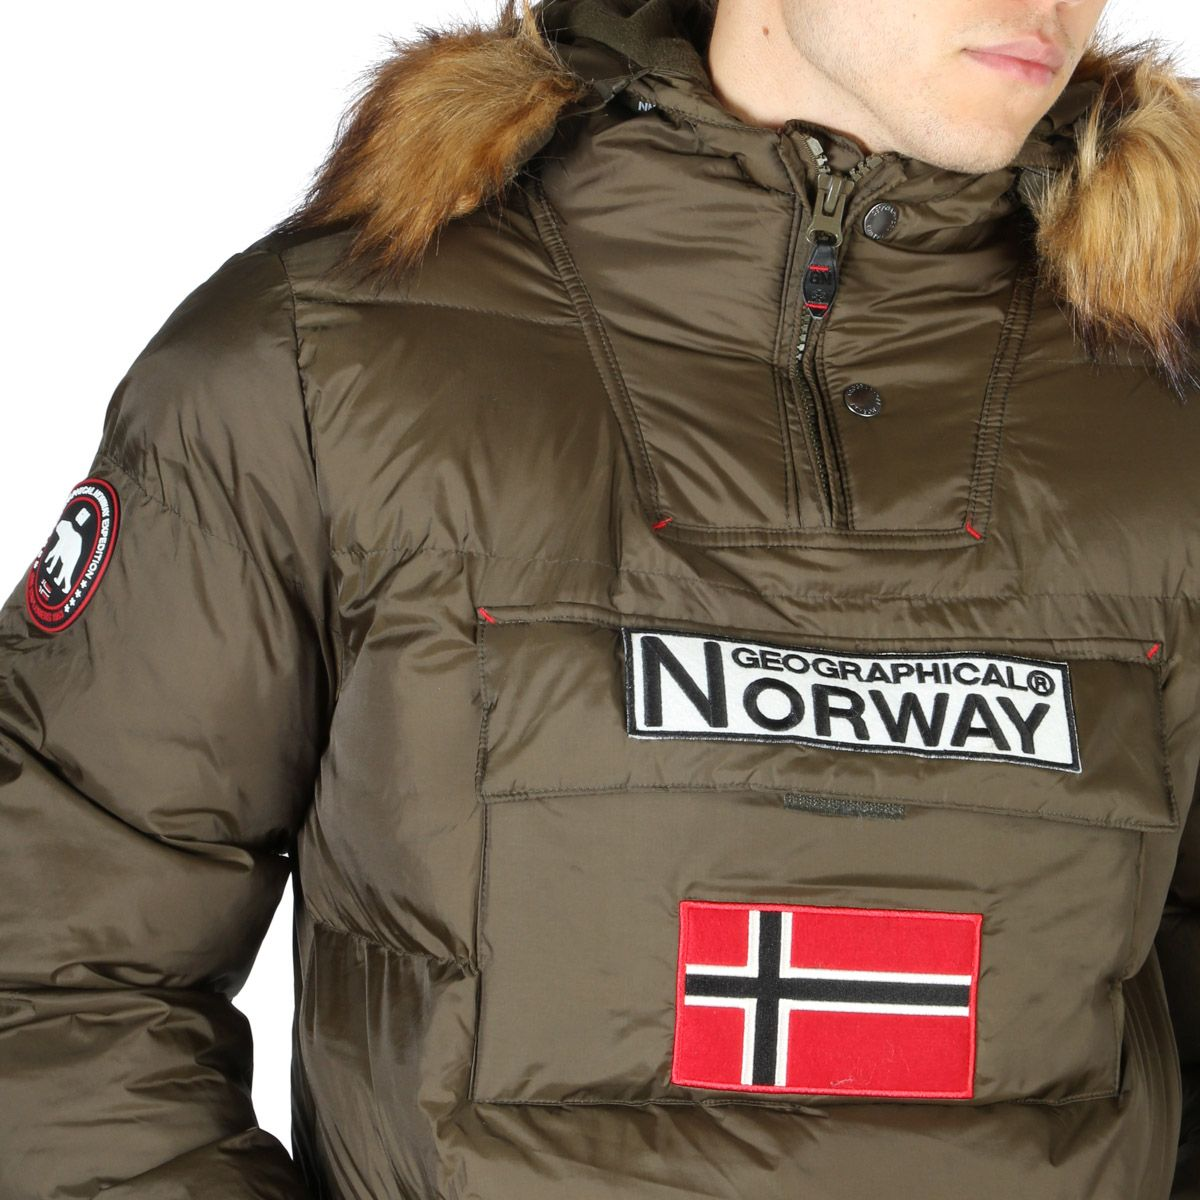 Vestes Geographical Norway – Bilboquet_man